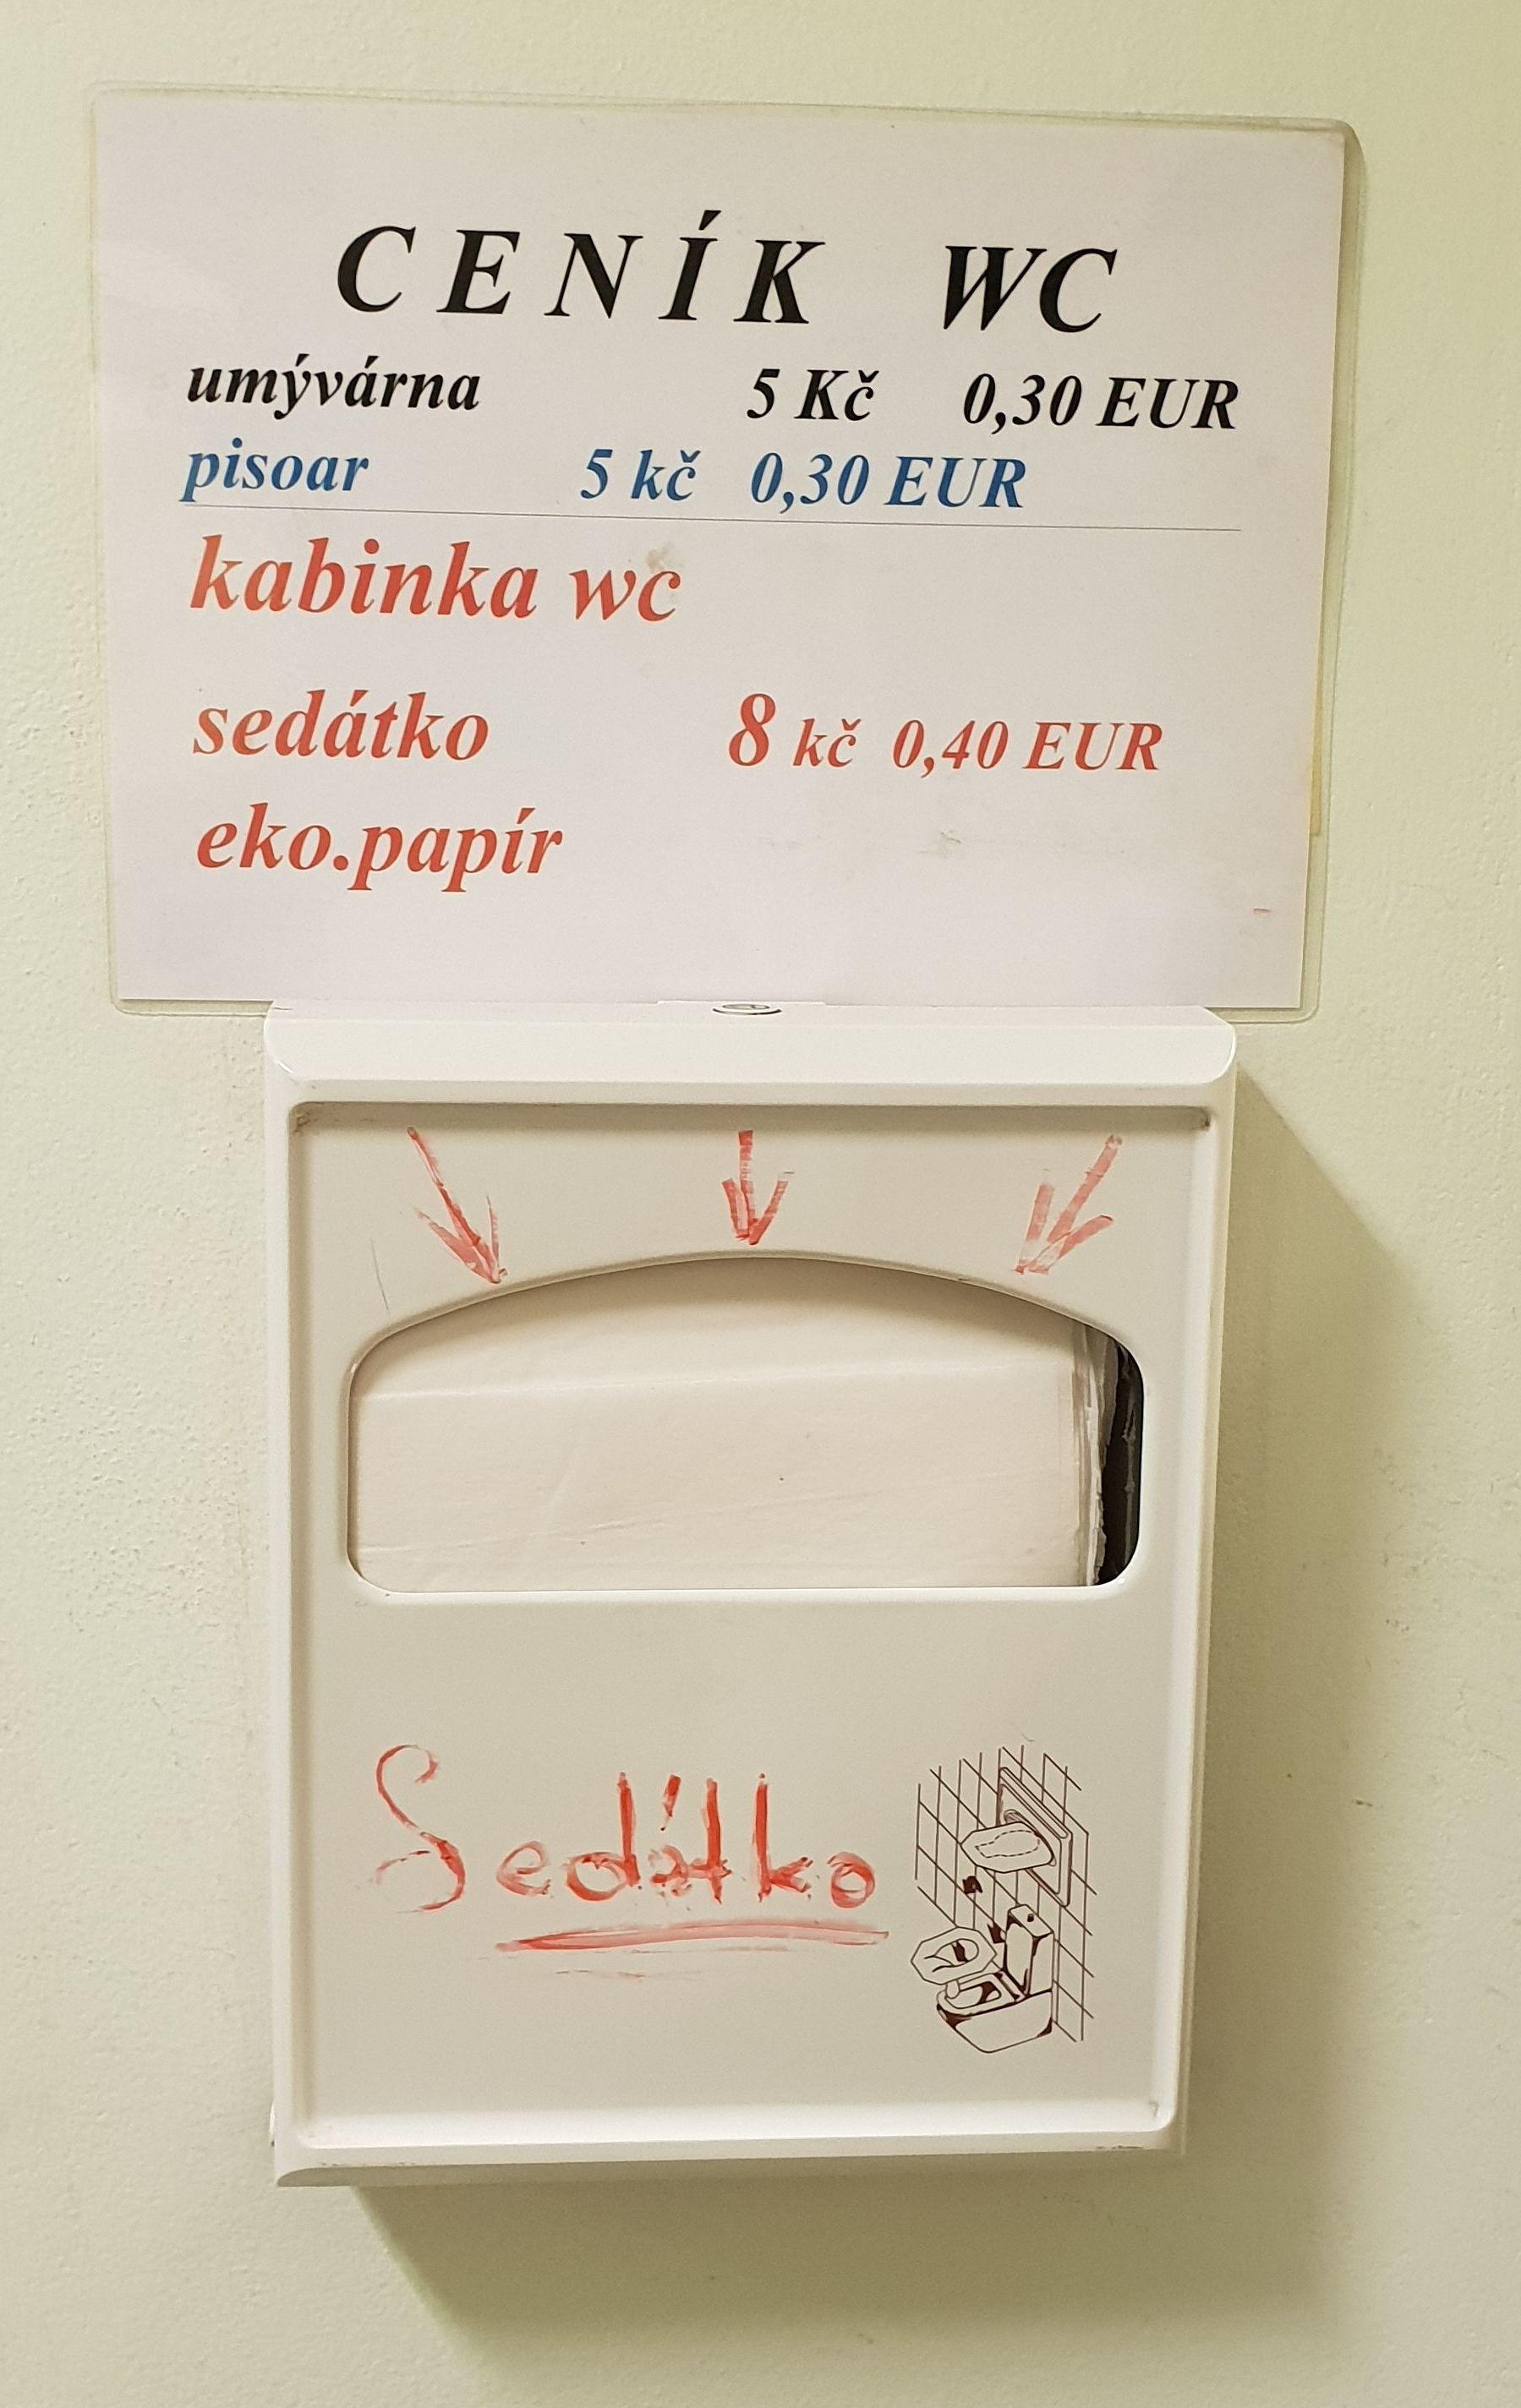 Obr. 3: Kde v Praze stojí veřejná kabinka WC kabinka + sedátko + ekopapír 0,40 EUR, tedy 40 centů?